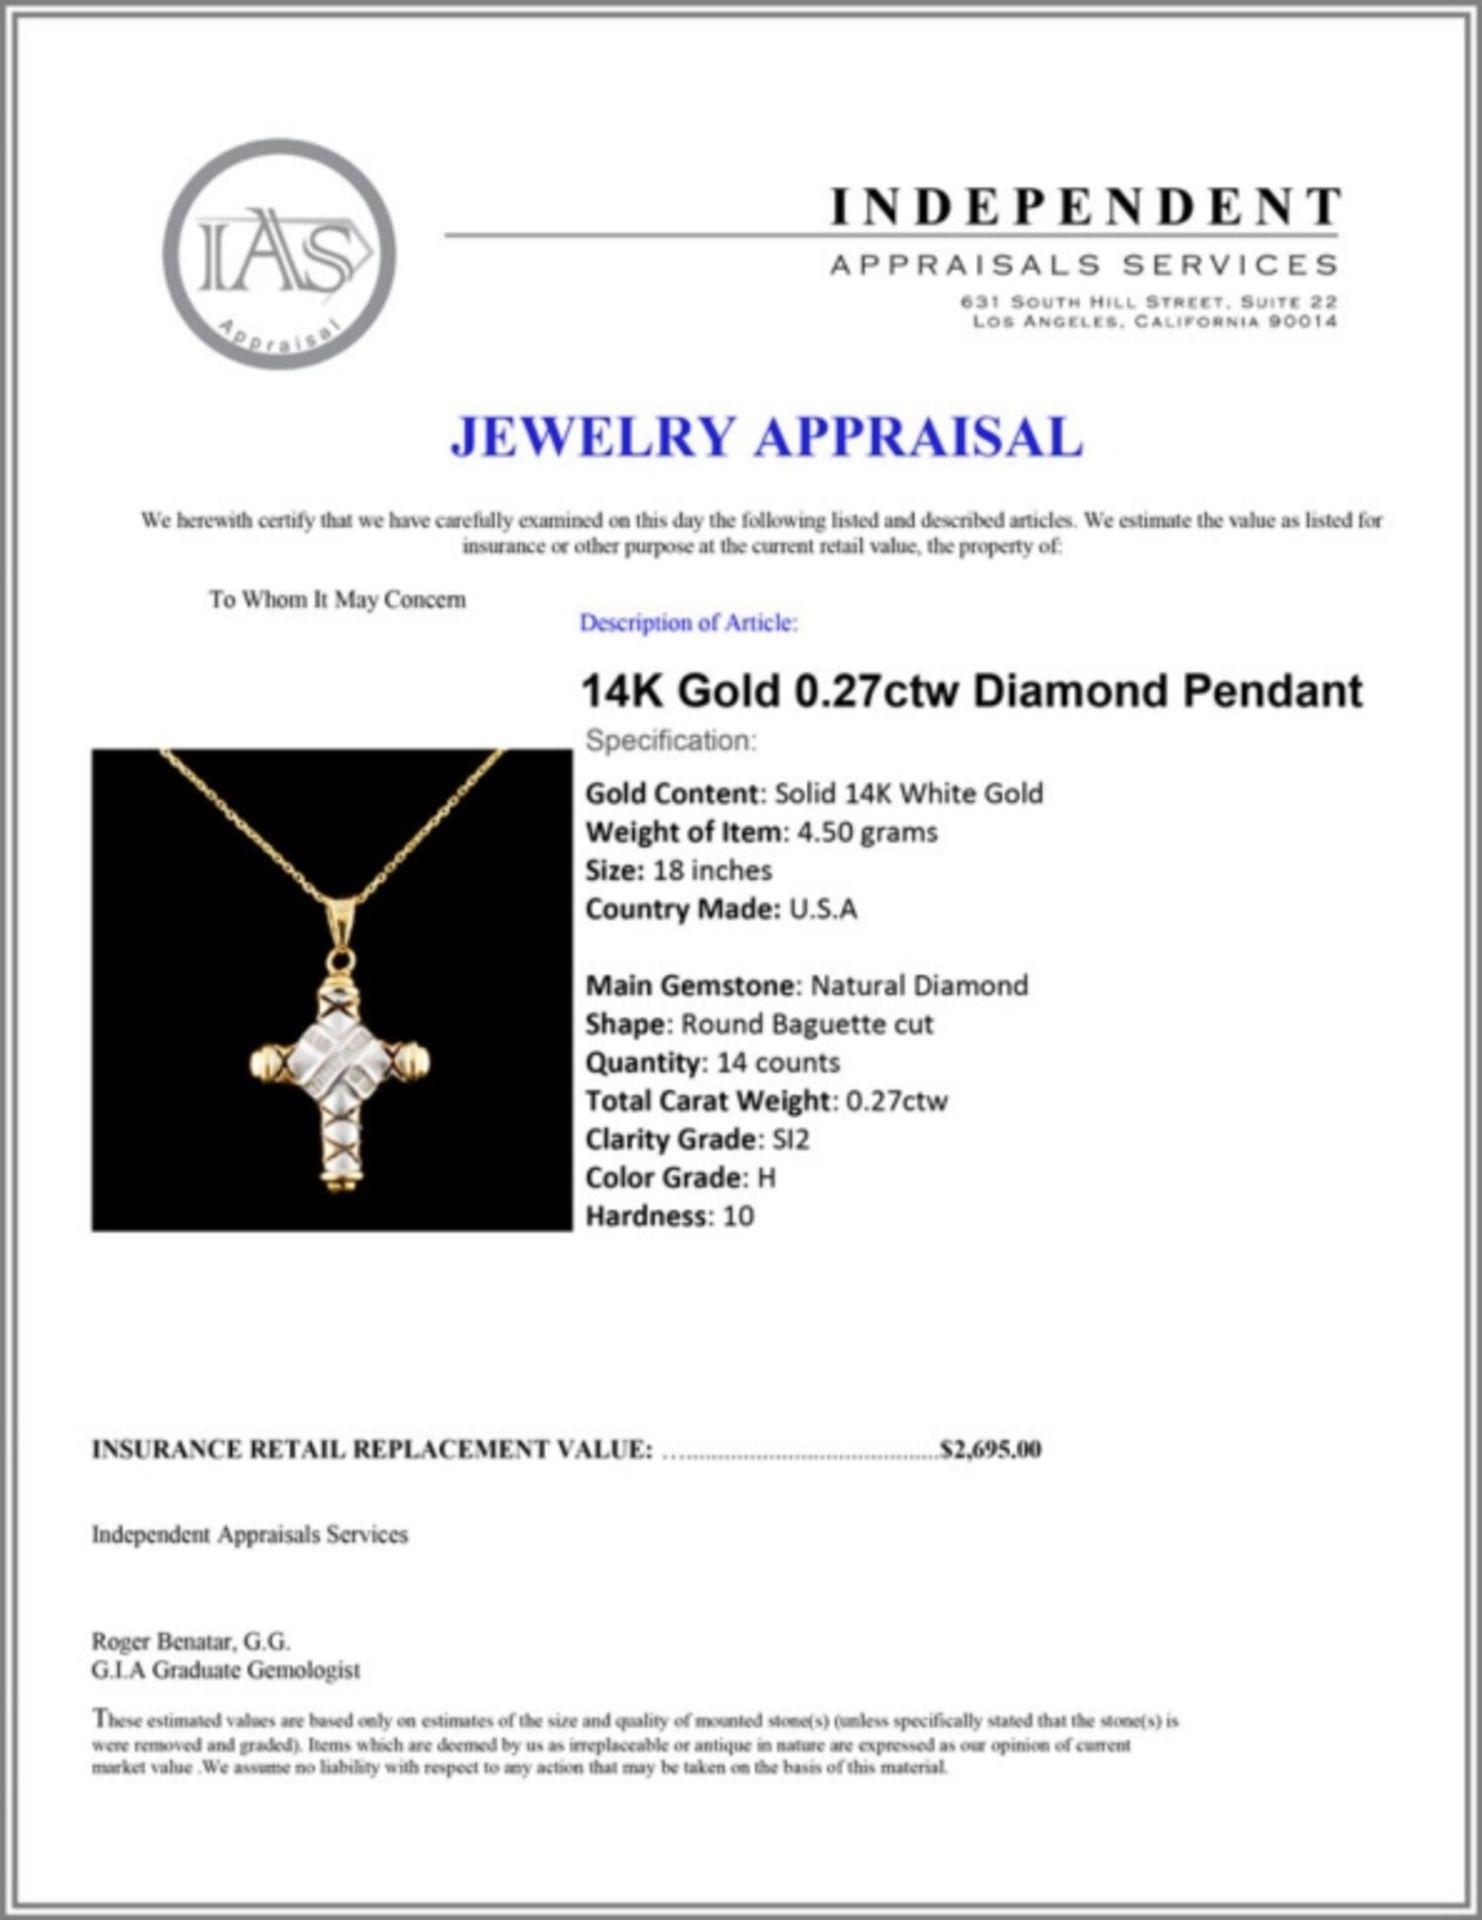 14K Gold 0.27ctw Diamond Pendant - Image 4 of 4